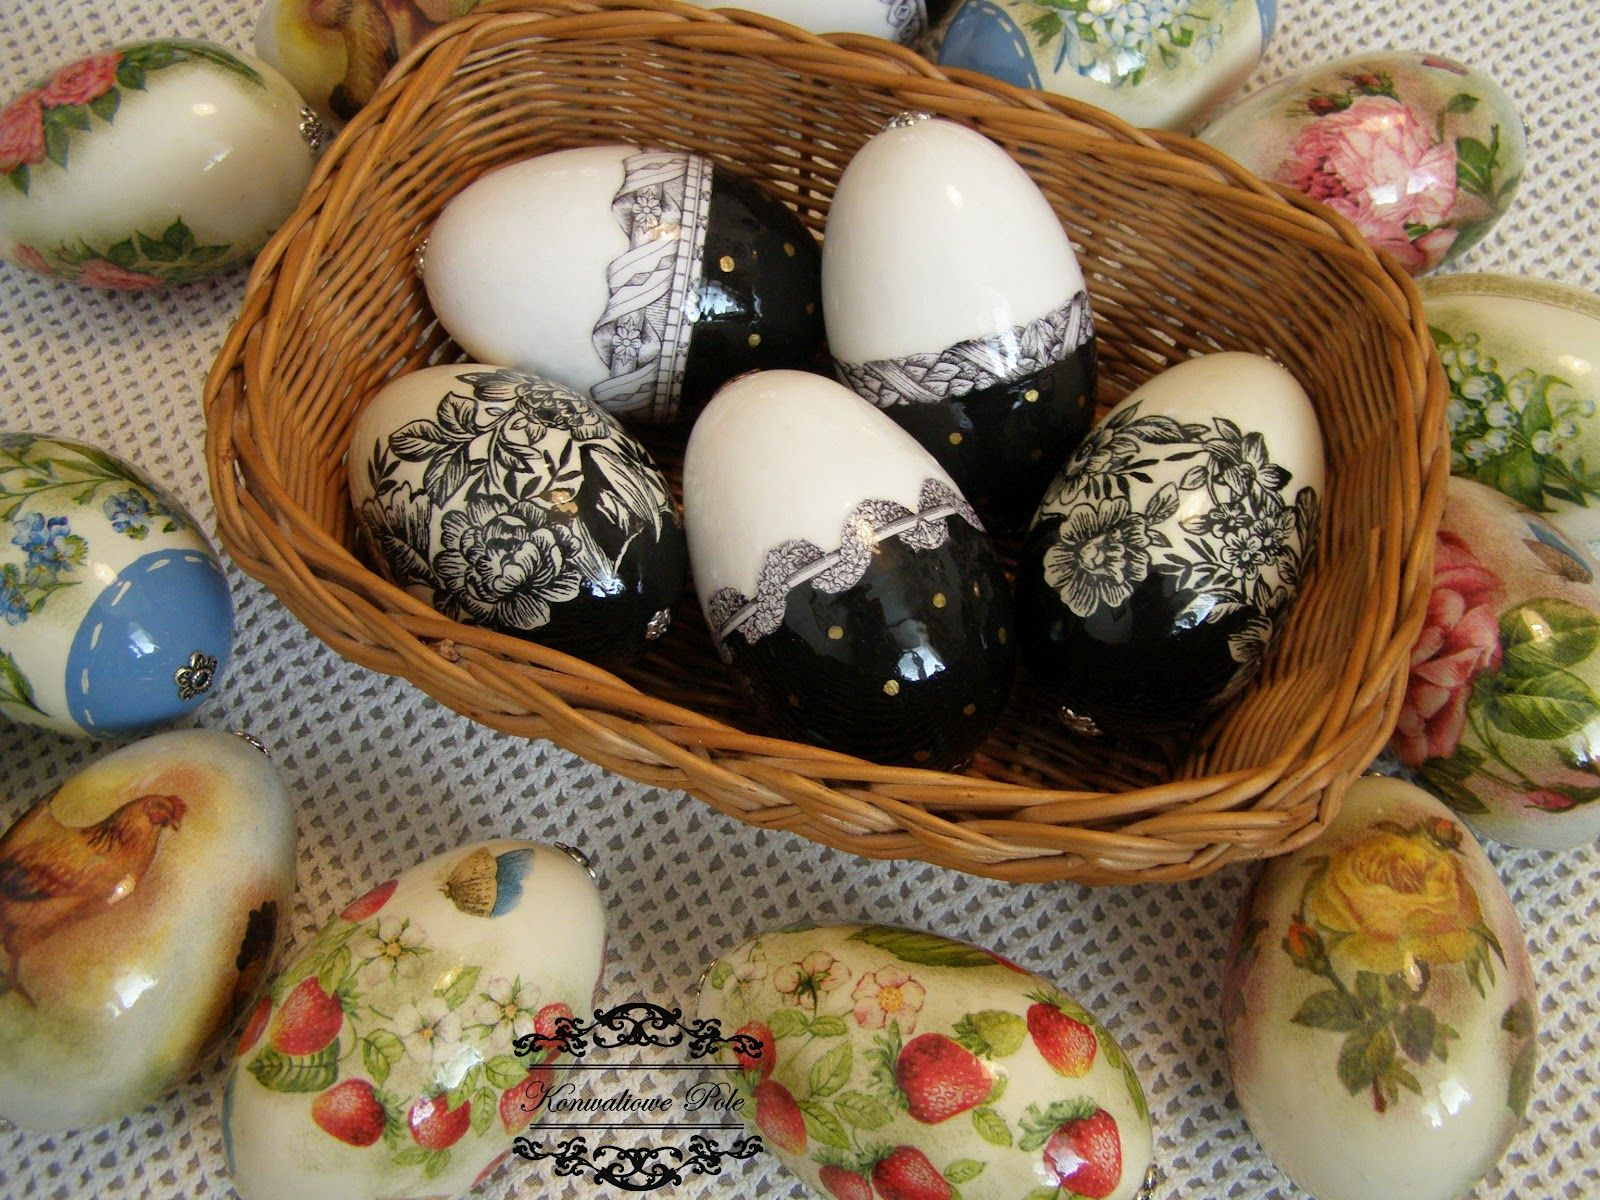 Strona Glowna Blox Pl Decoupage Pysanky Eggs Easter